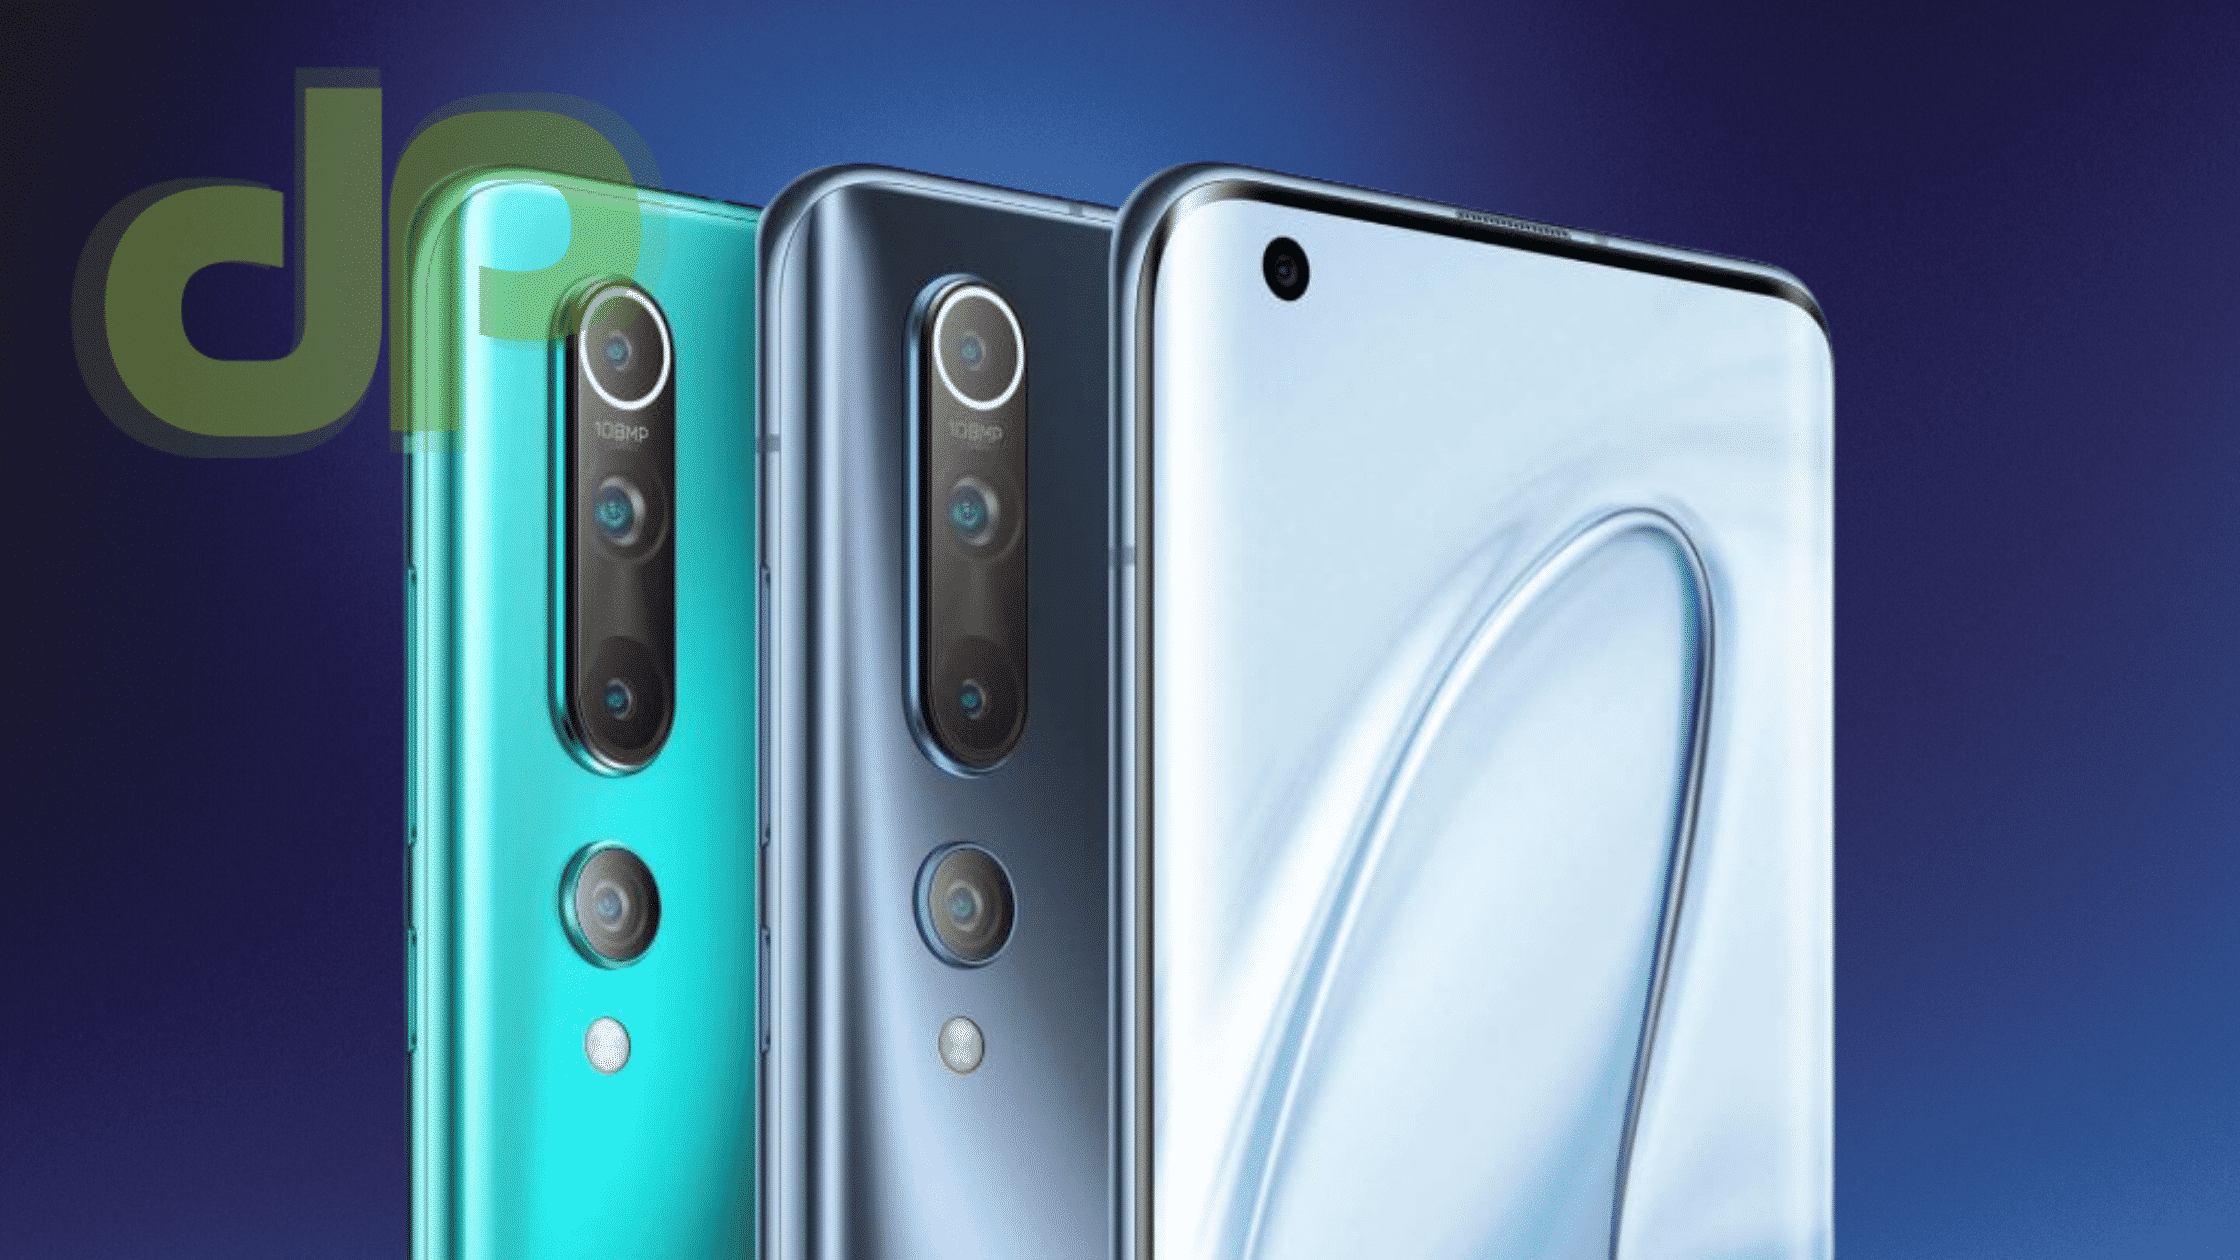 Xiaomi Mi 10 Versi pengisian cepat 120W